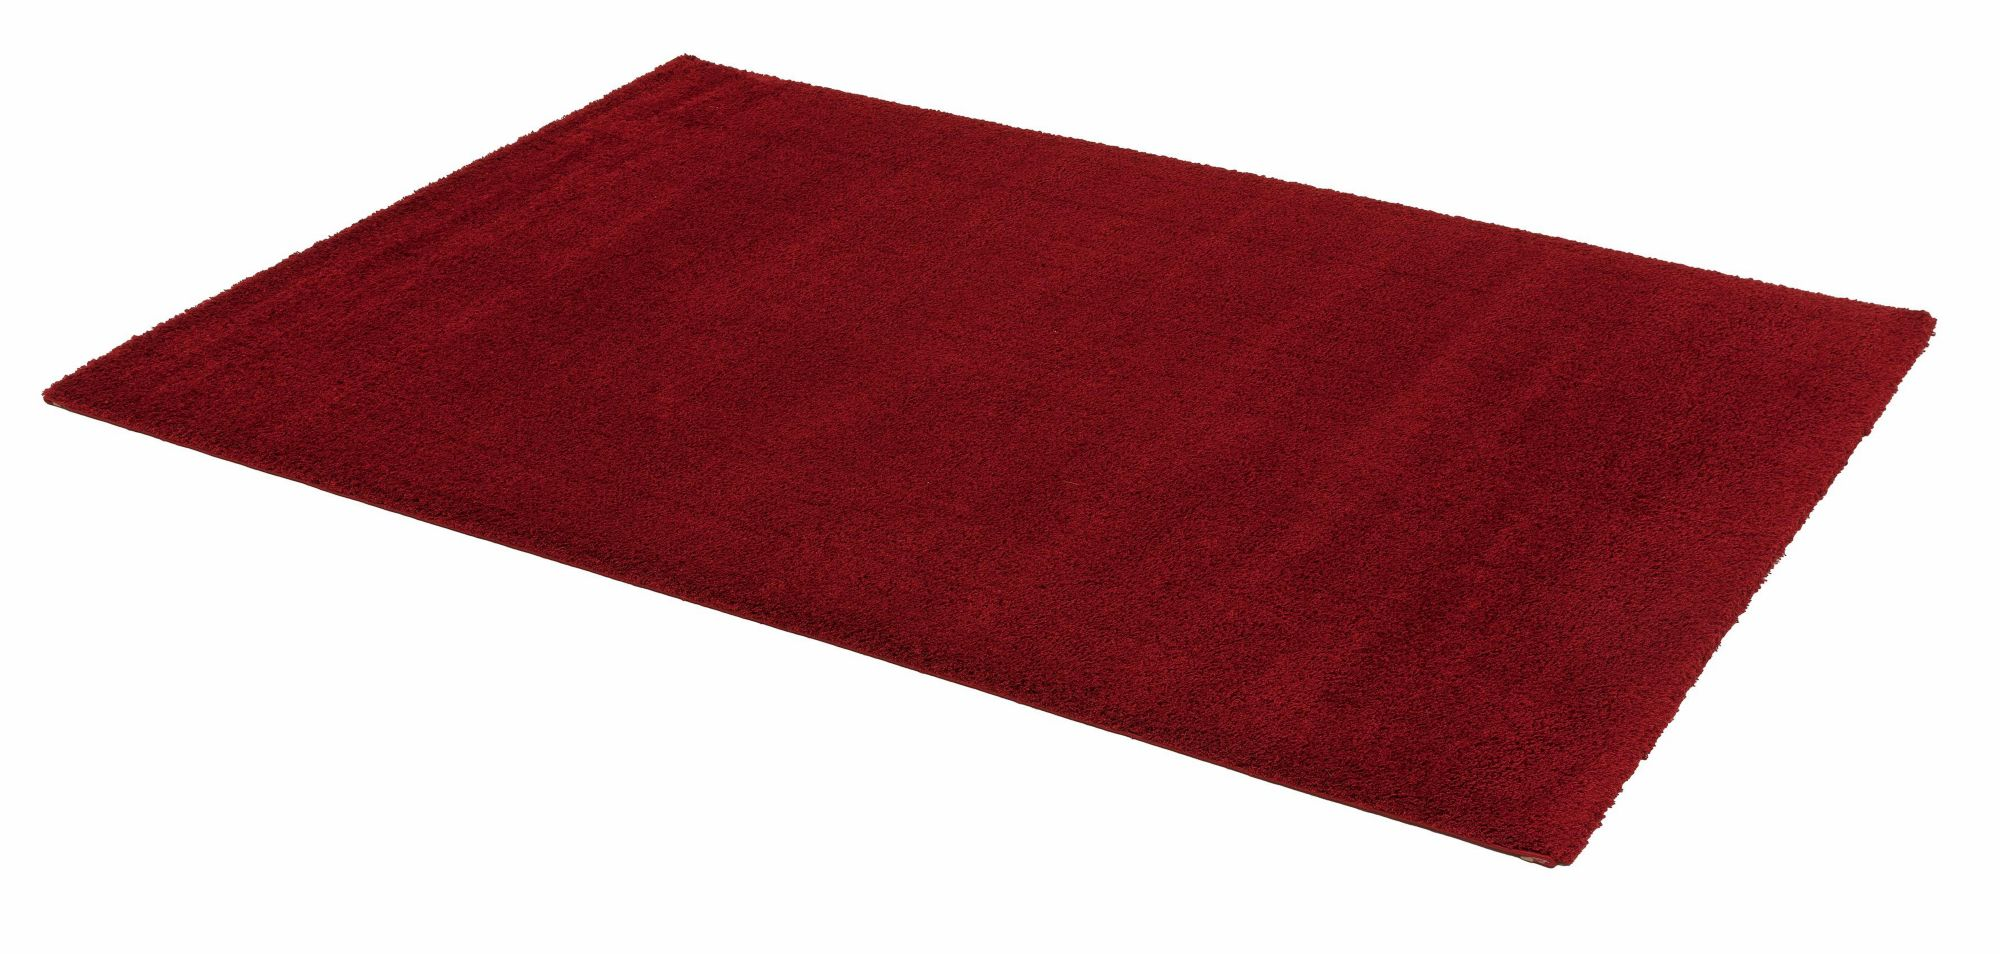 ASTRA Hochflor-Teppich, Astra, »Rivoli«, Höhe 30 mm, gewebt